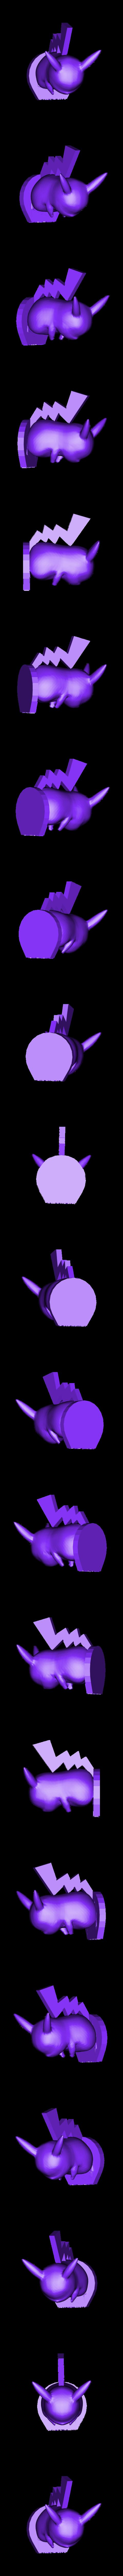 Pikachu_yytt-3Dbd.stl Download free STL file Pickachu • 3D printable design, tim54lol